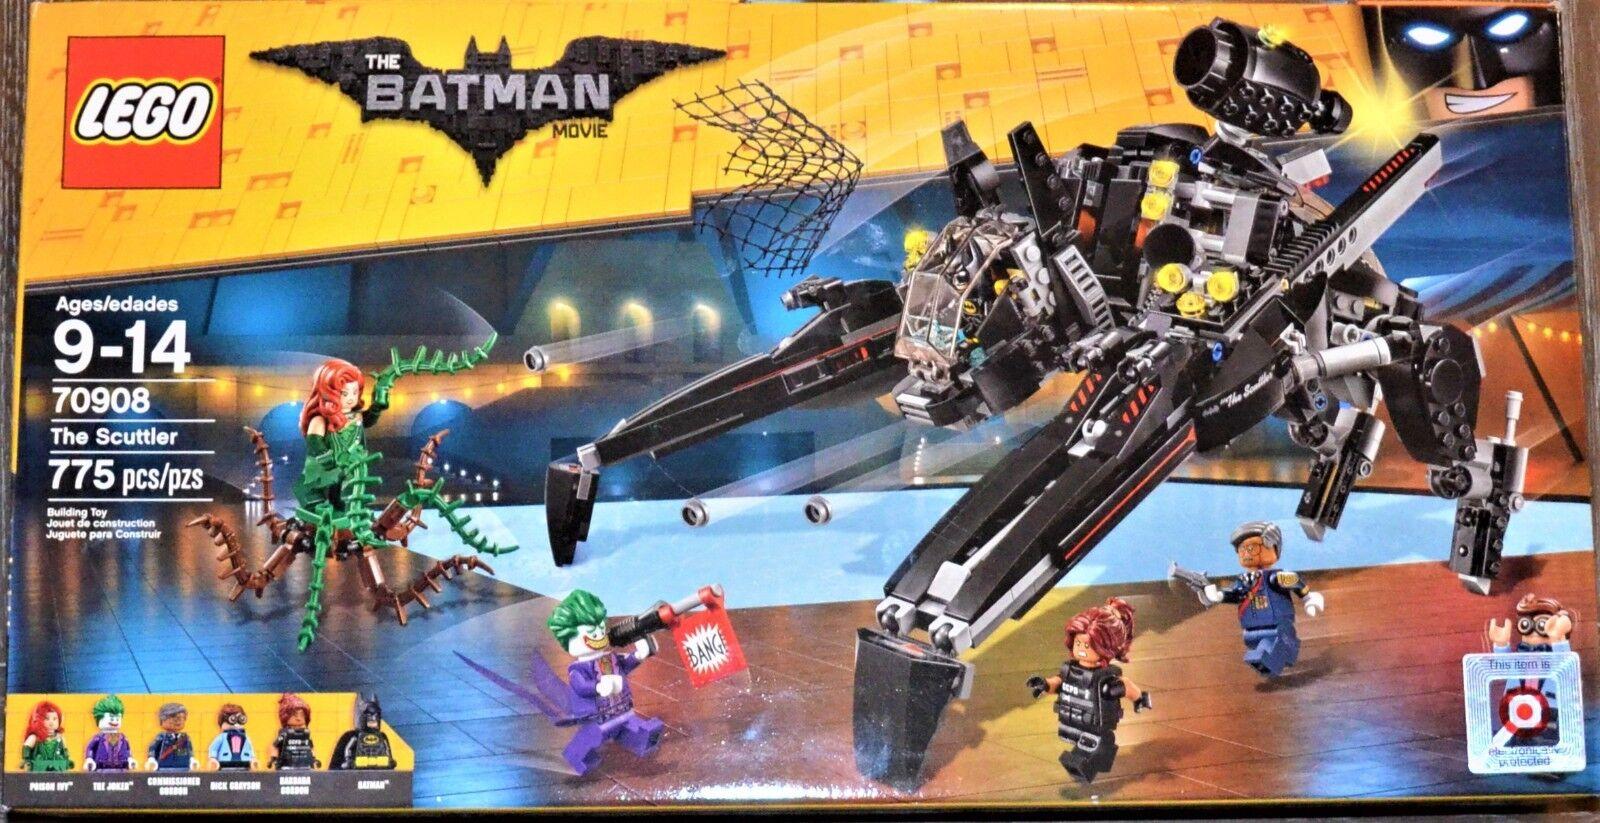 NEW LEGO THE BATMAN MOVIE 2017   THE SCUTTLER   70908 THE JOKER POISON IVY FIGHT